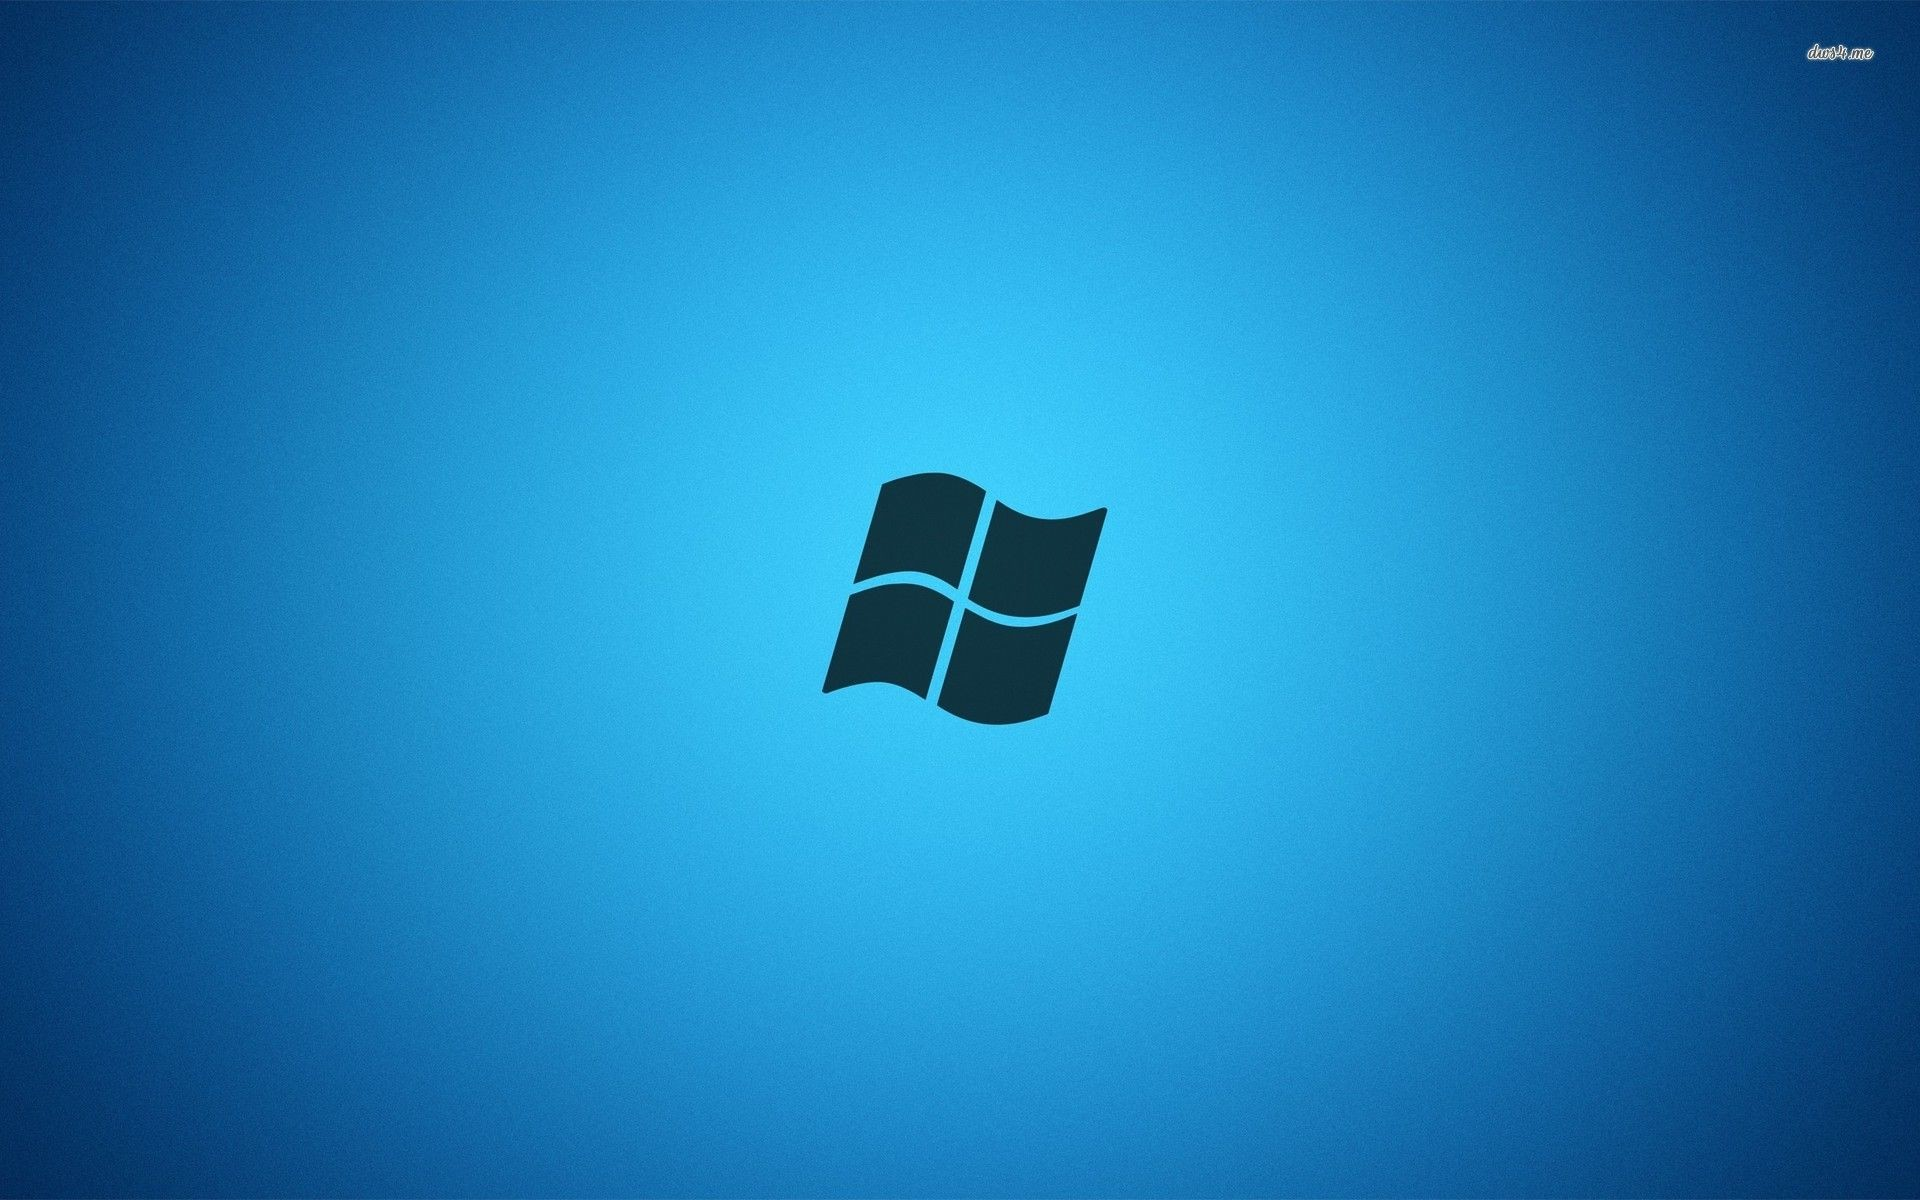 Dark blue Windows 7 logo wallpaper – Computer wallpapers – #44304